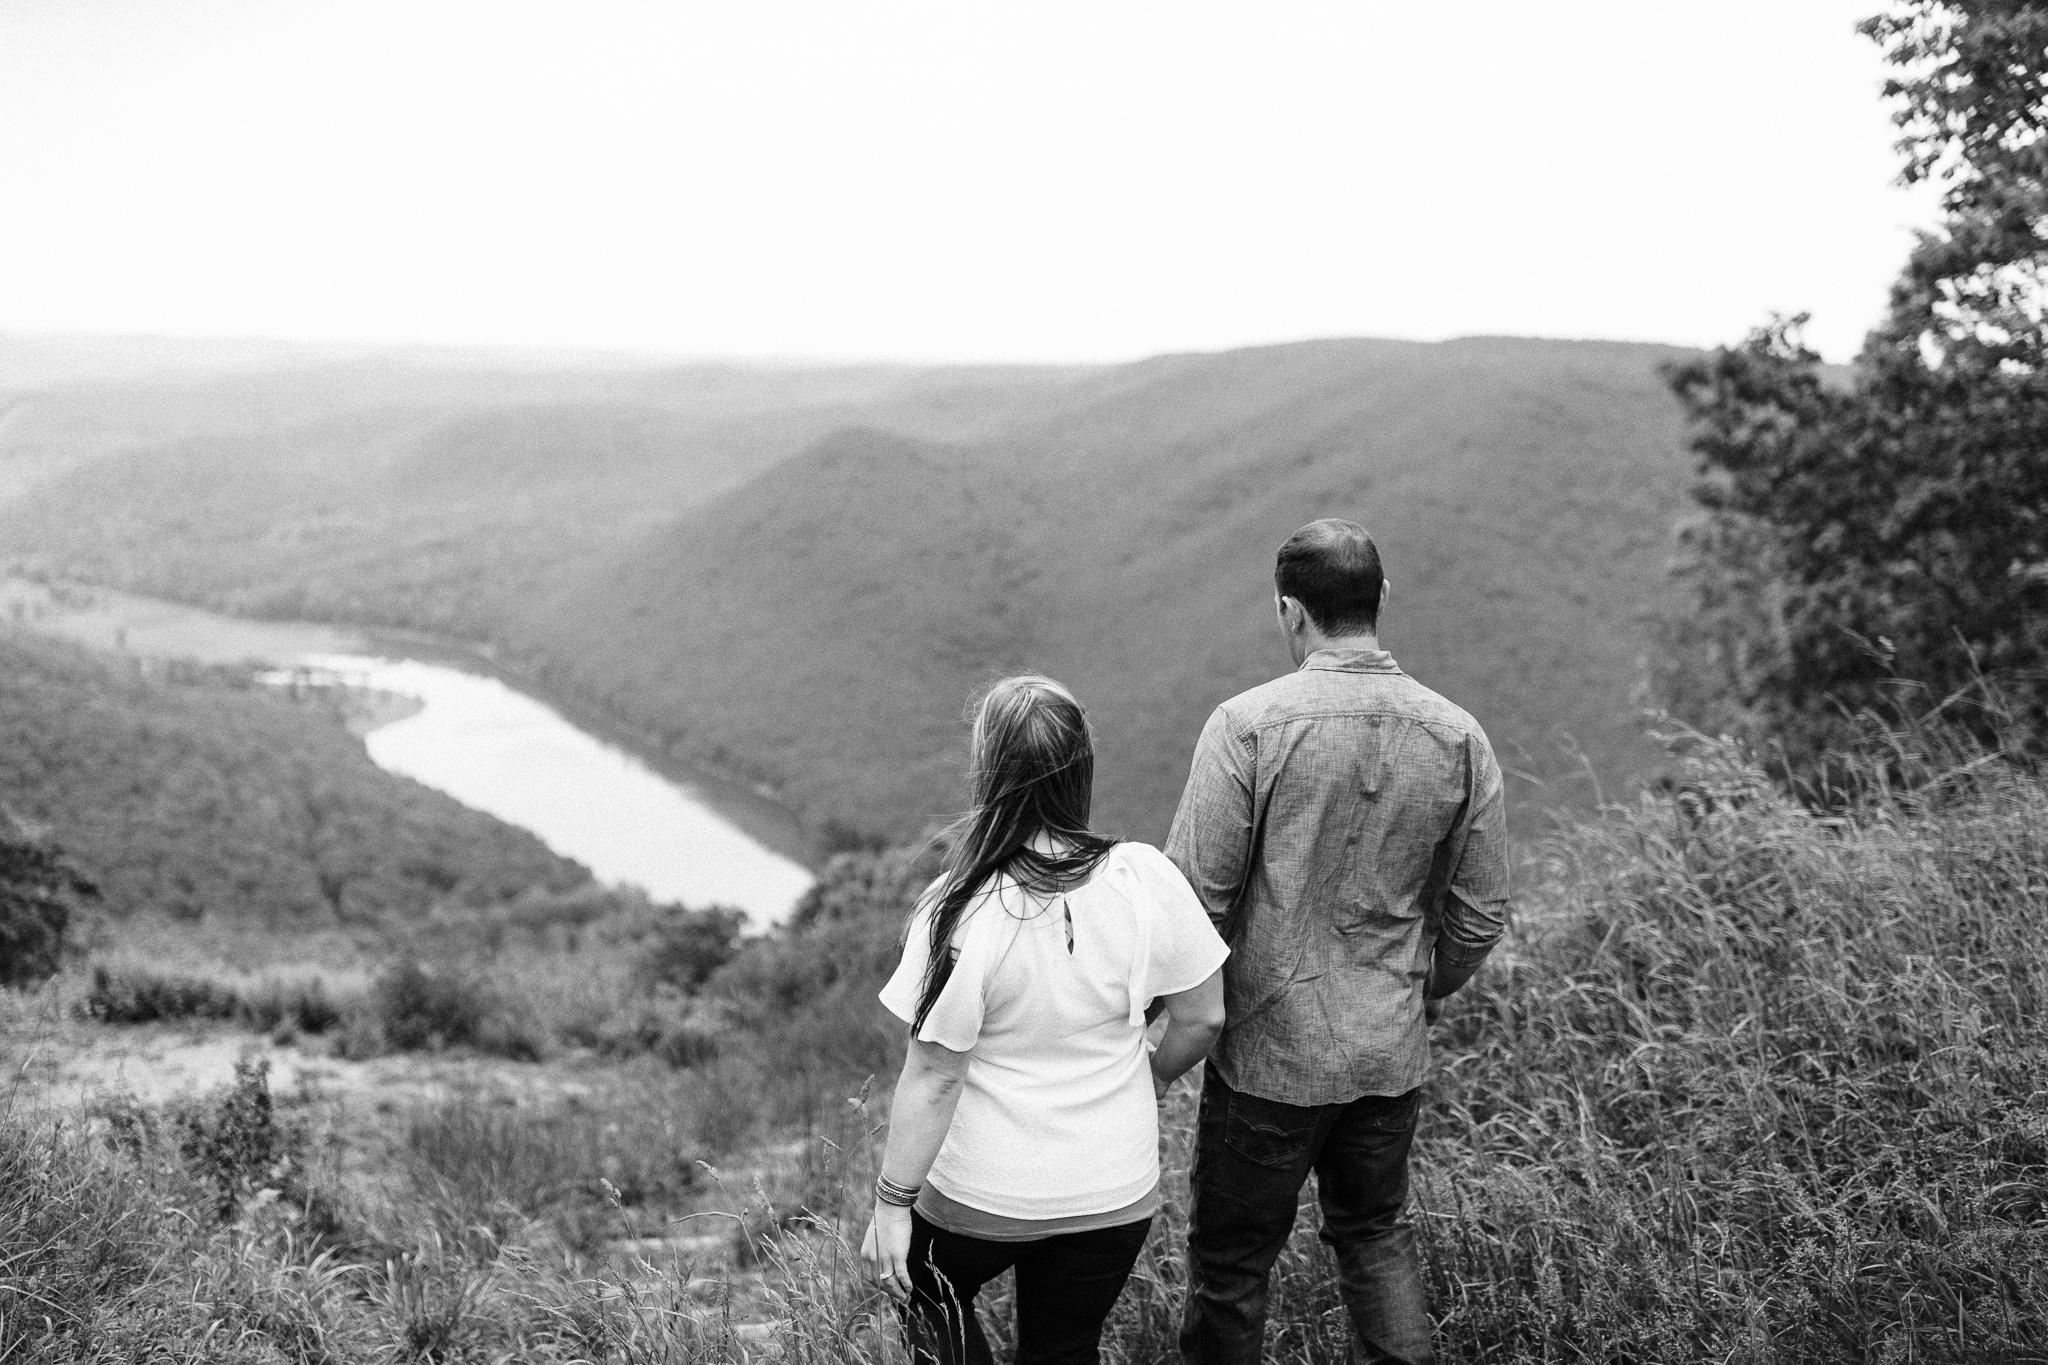 Kettle-creek-state-park-engagement-9720.jpg